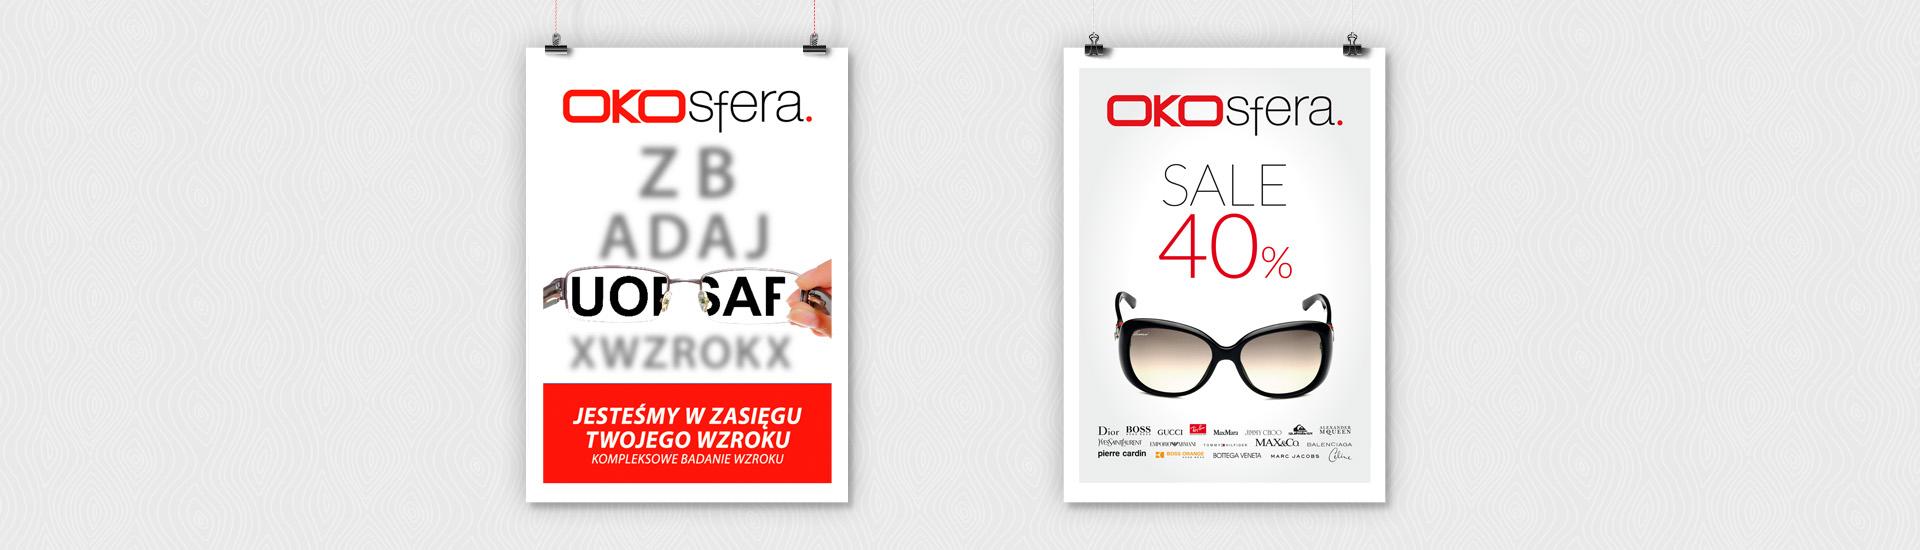 Plakaty reklamowe OKOsfera.